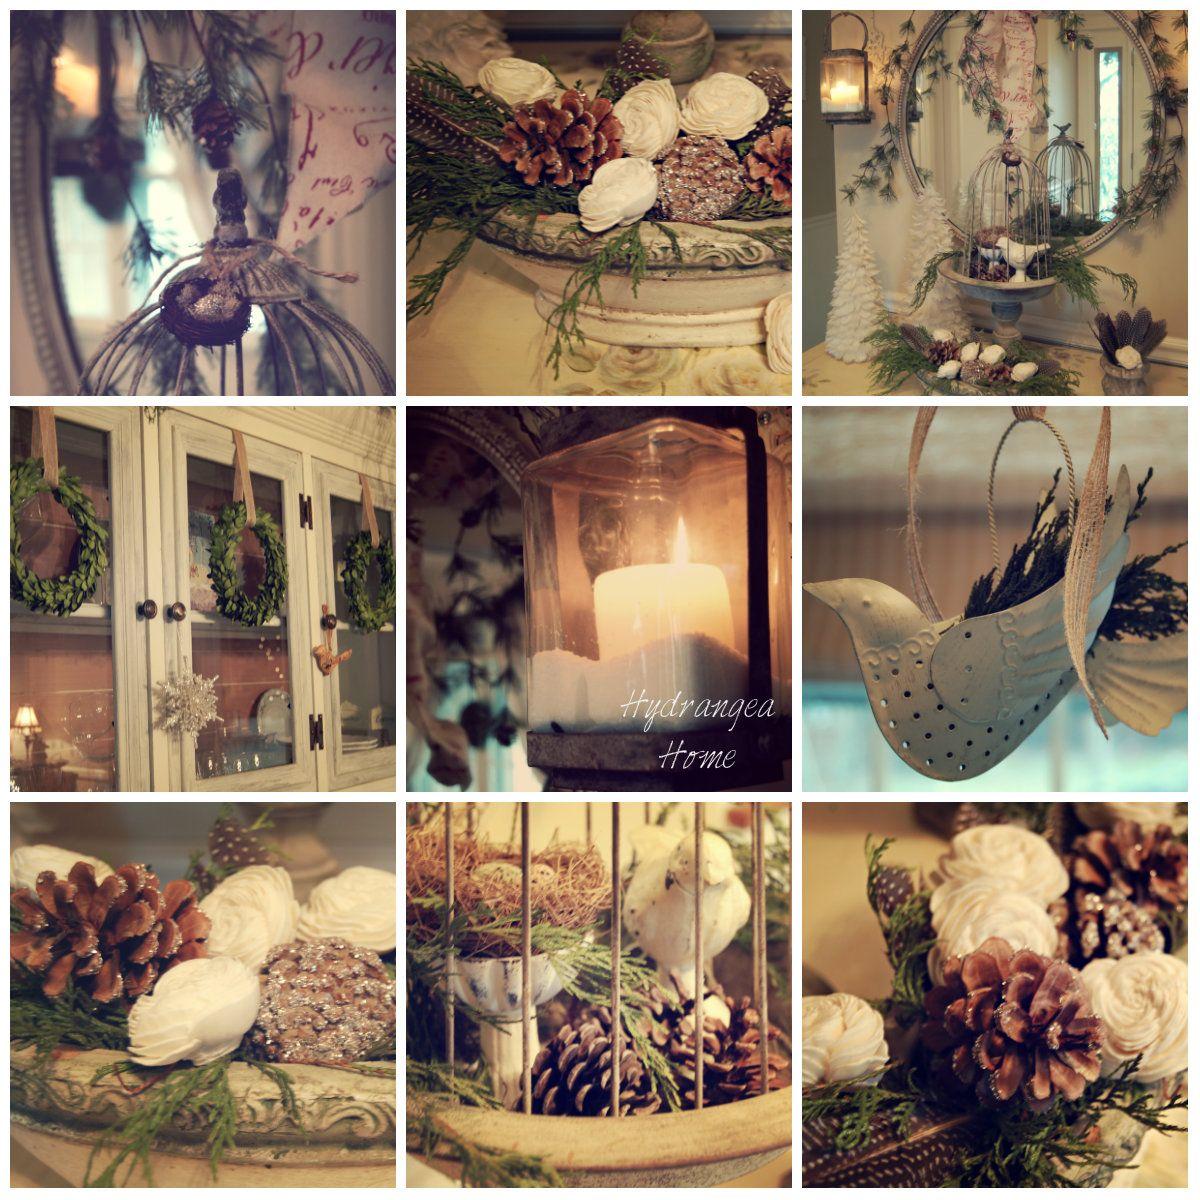 Hydrangea Home by Dawn's Designs